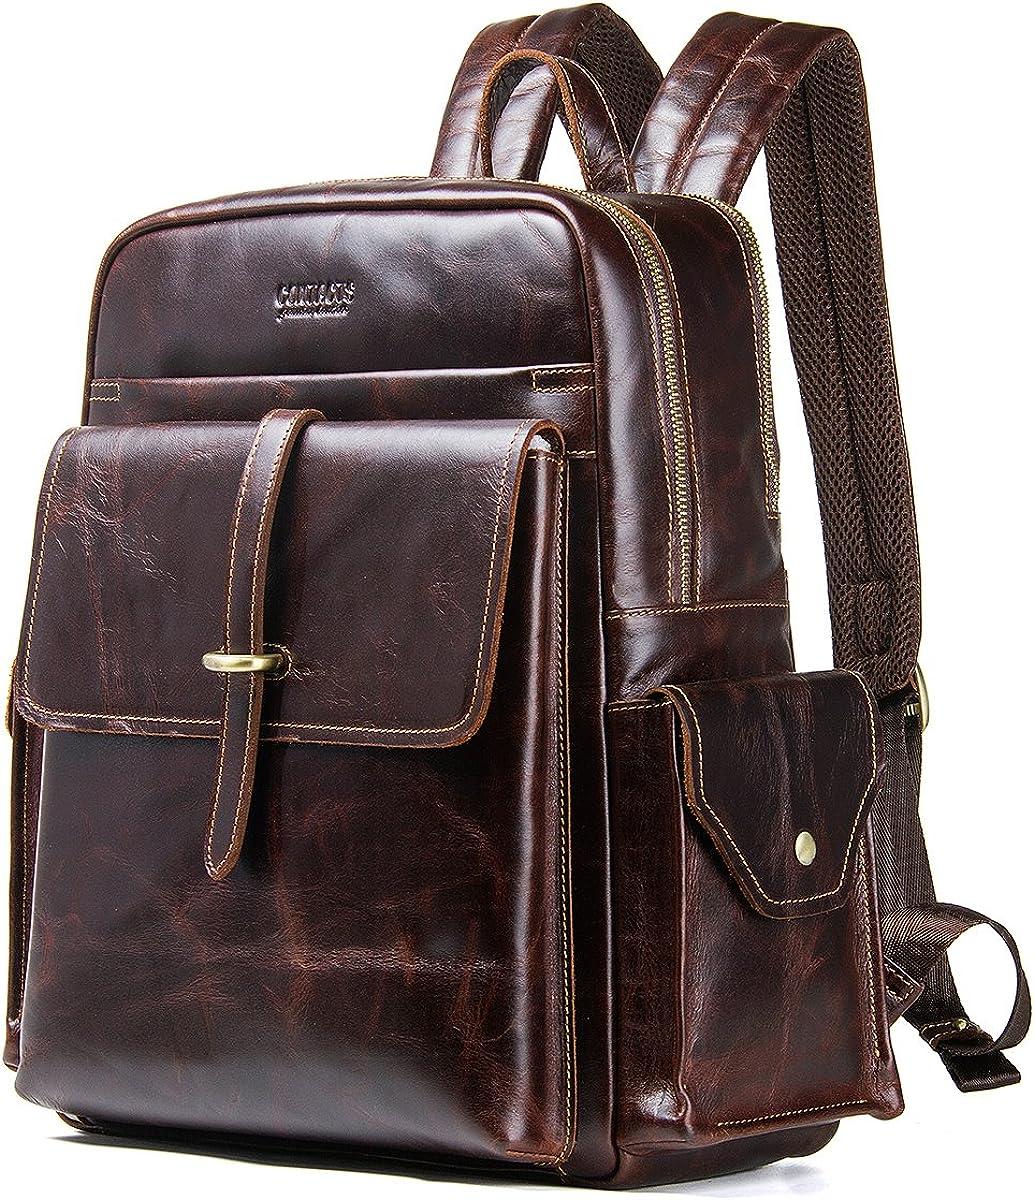 "Contacts Genuine Leather Men 13"" Laptop Computer Backpack Travel Handbag School Backpacks Bag"